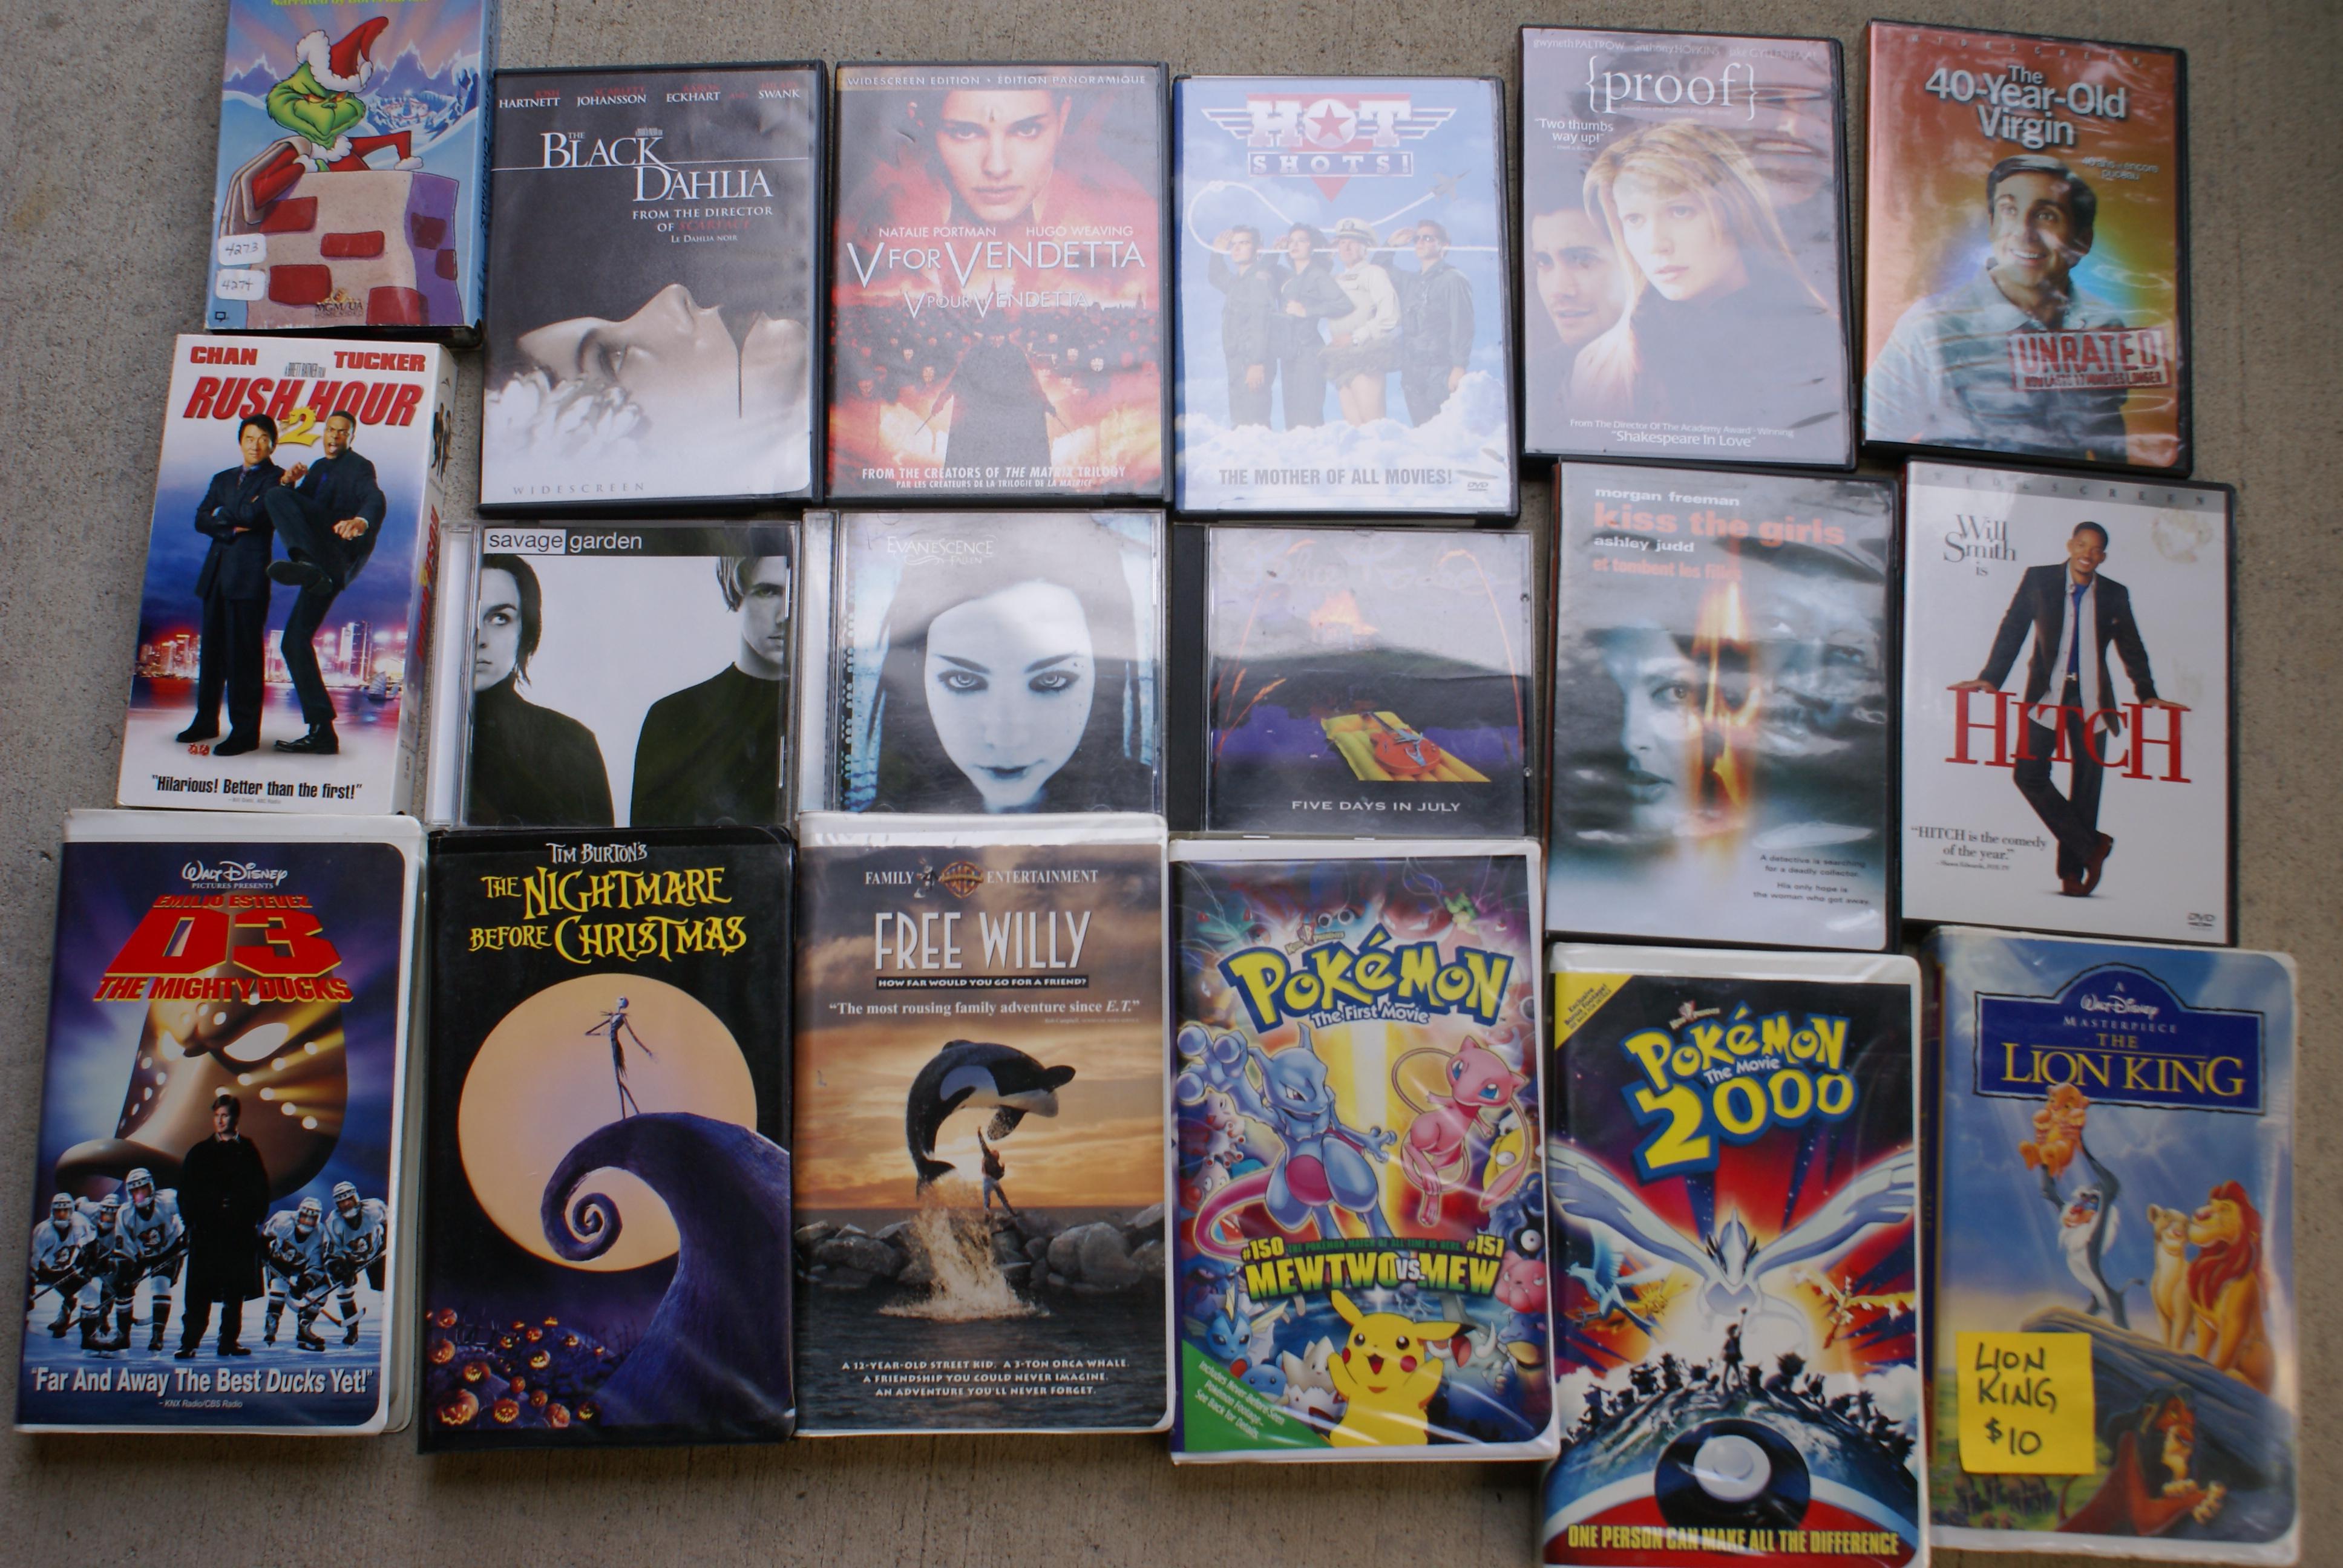 random-movies-vhs-dvd-cd